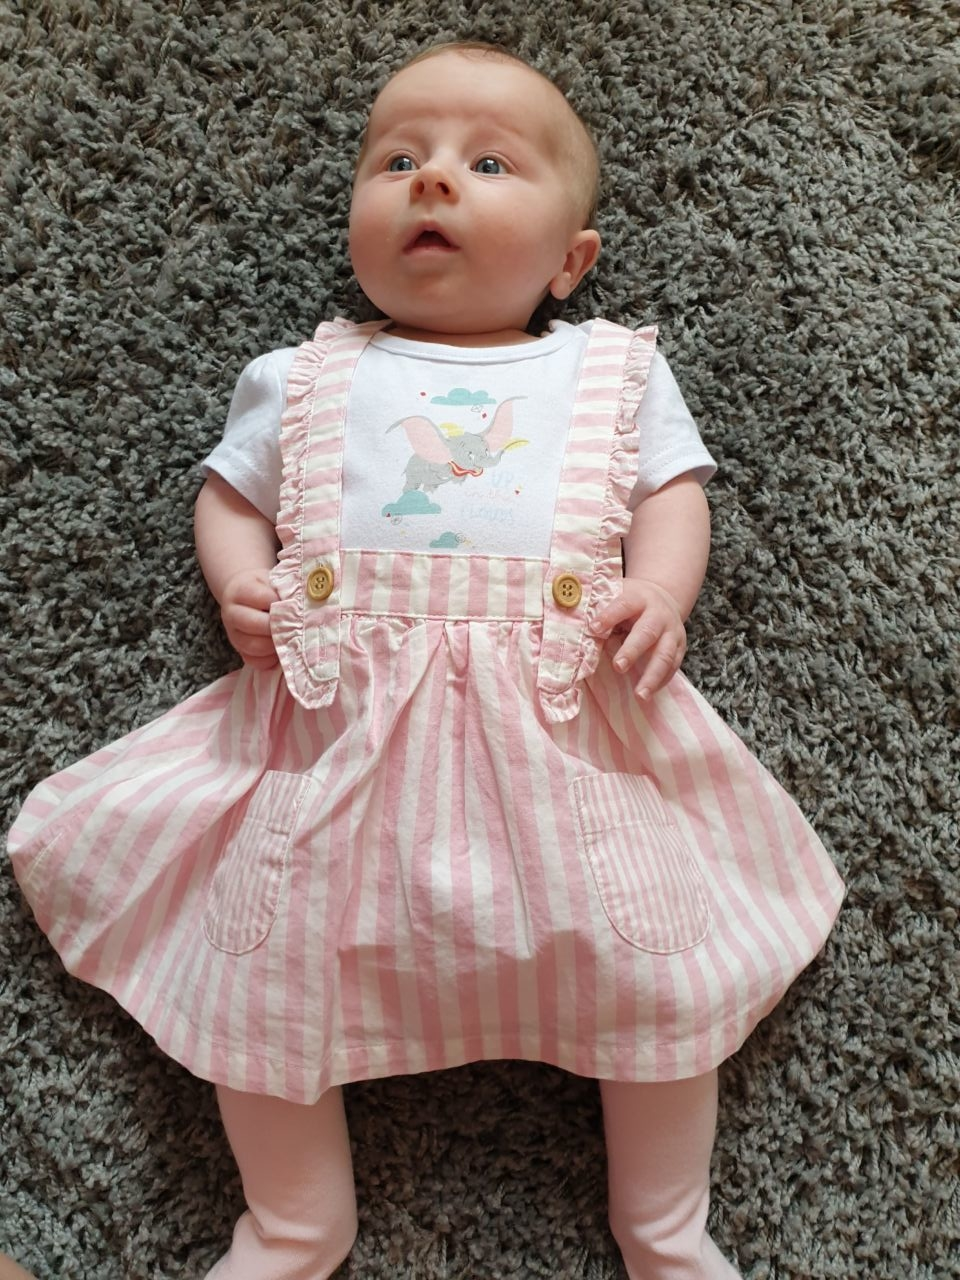 Emmy at 3 months